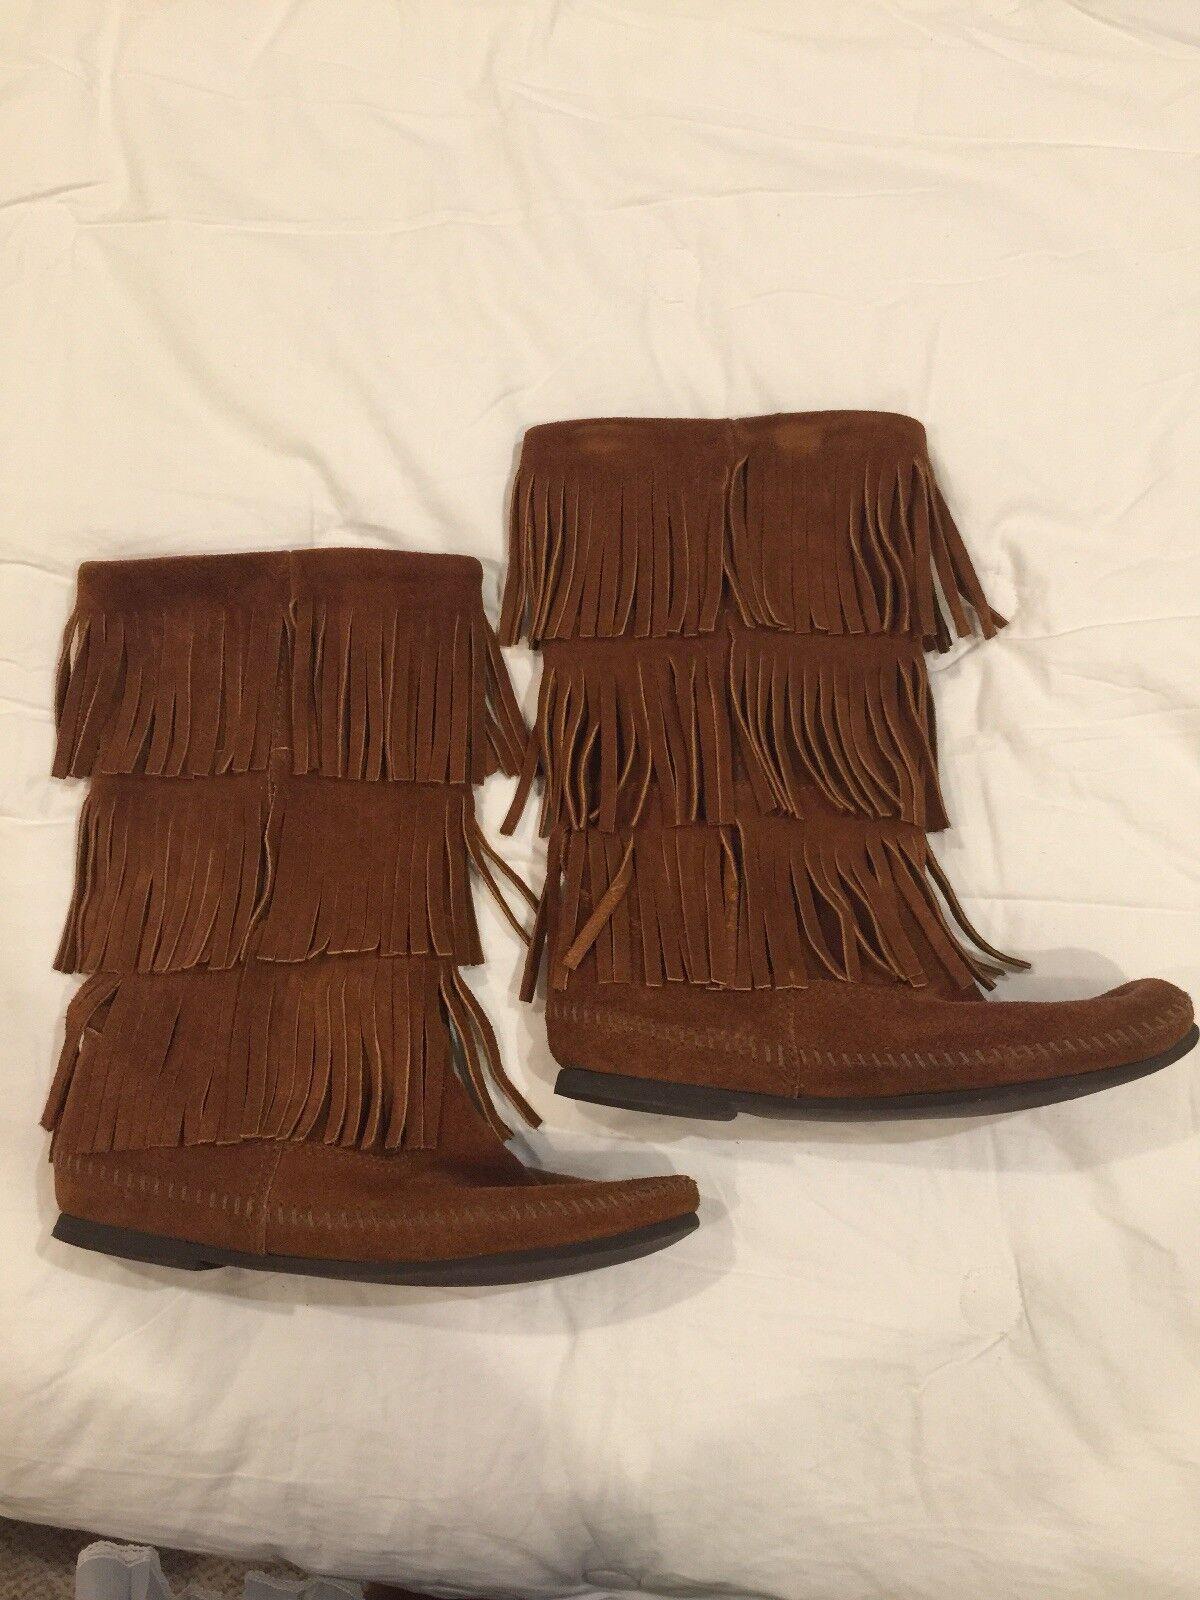 Minnetonka 3 Layer Fringe Boots Brown 9 GUC